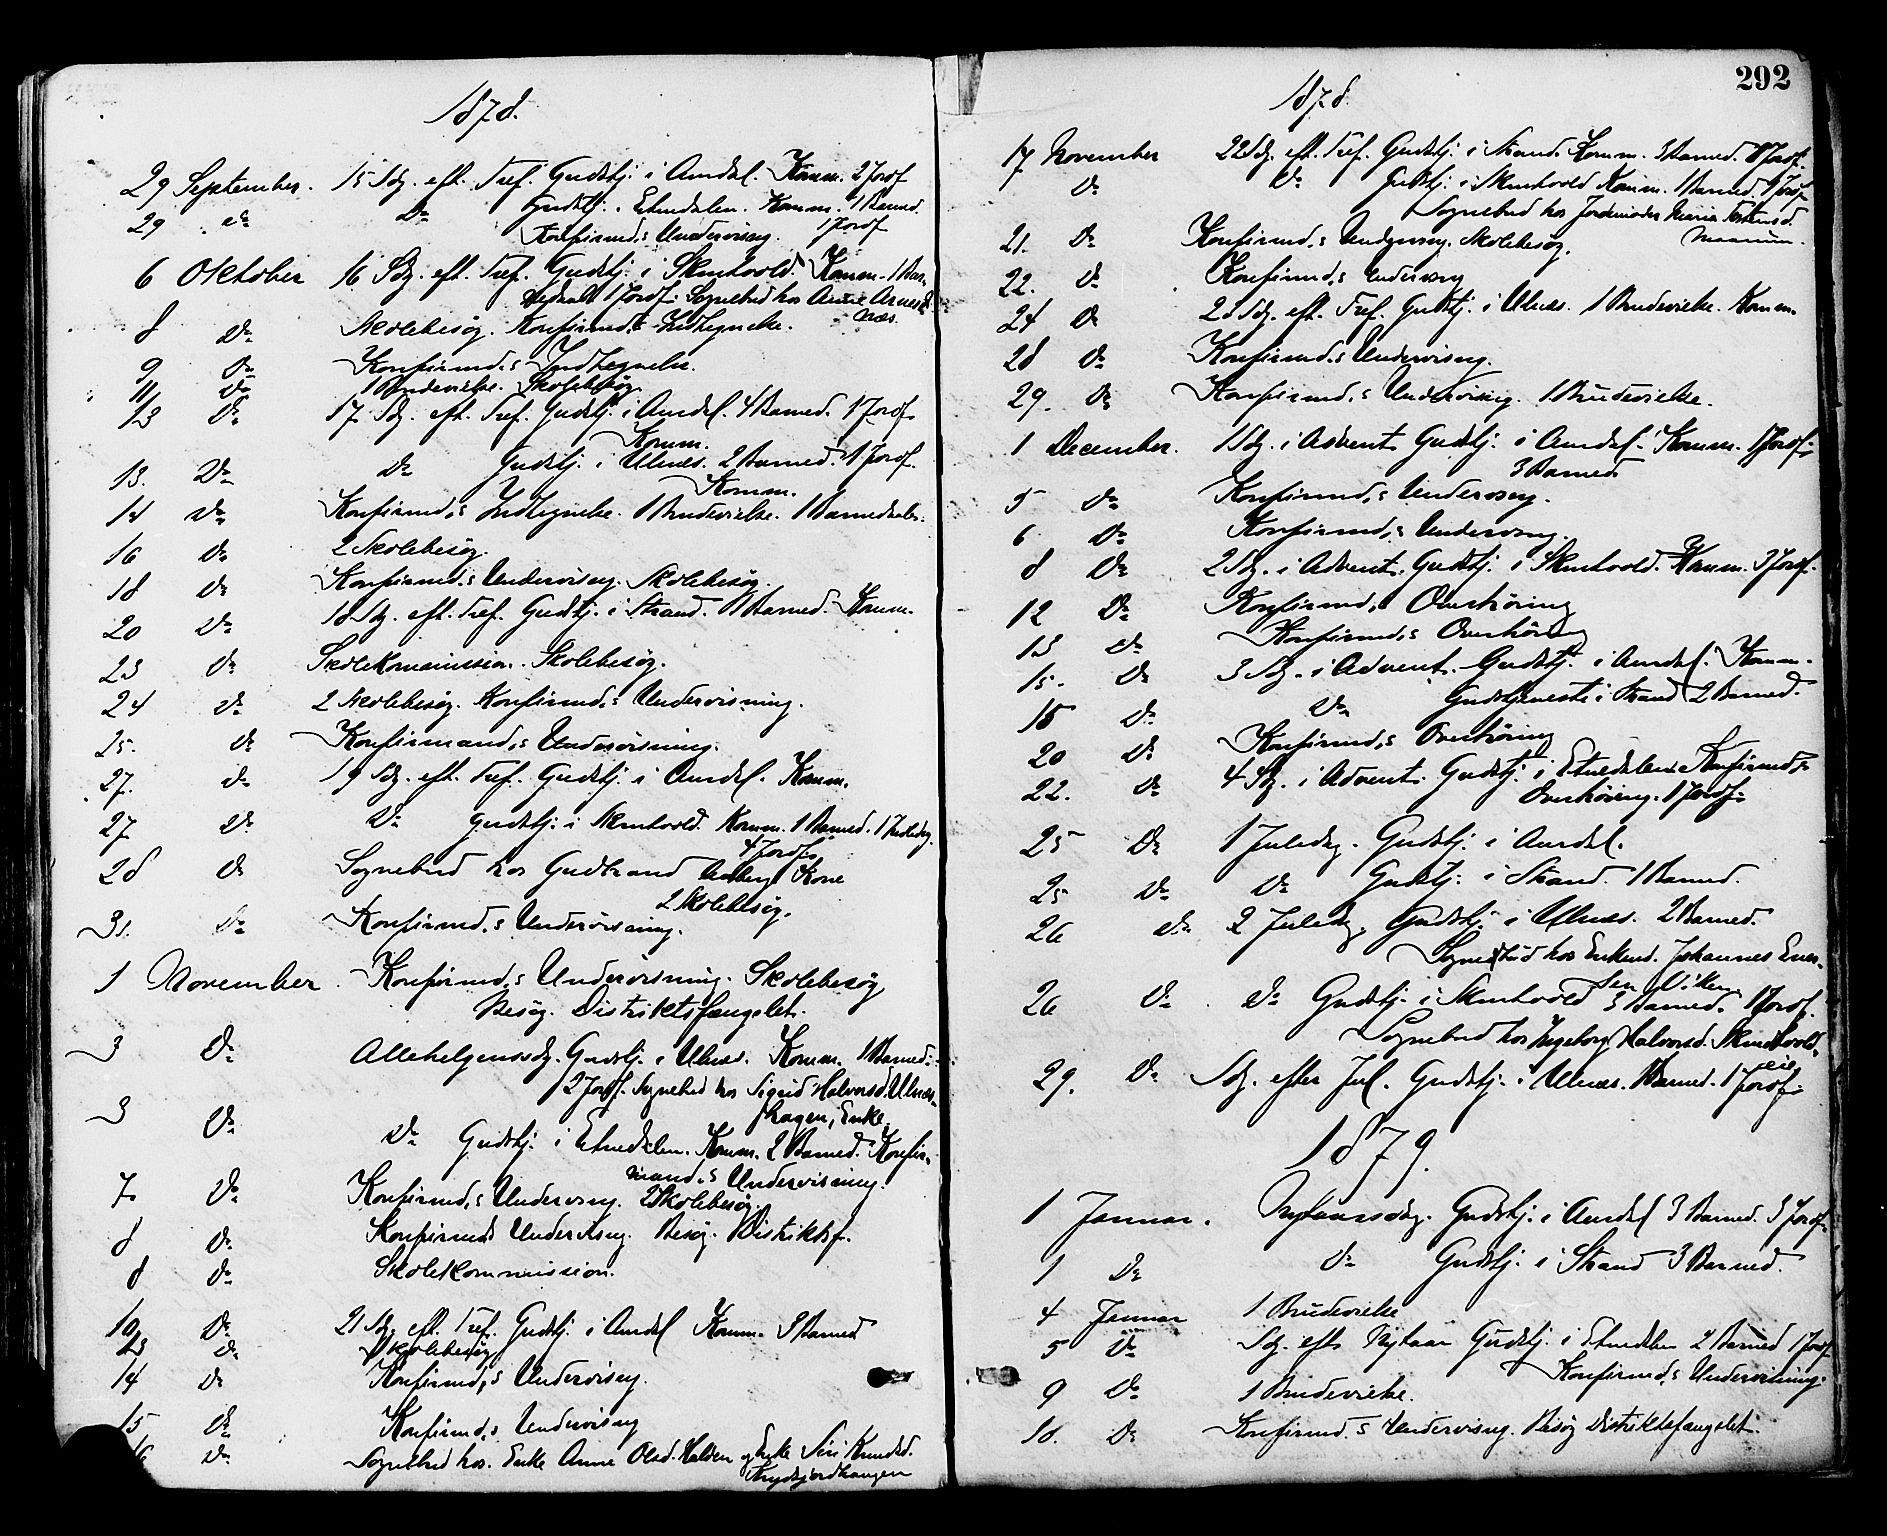 SAH, Nord-Aurdal prestekontor, Ministerialbok nr. 9, 1876-1882, s. 292